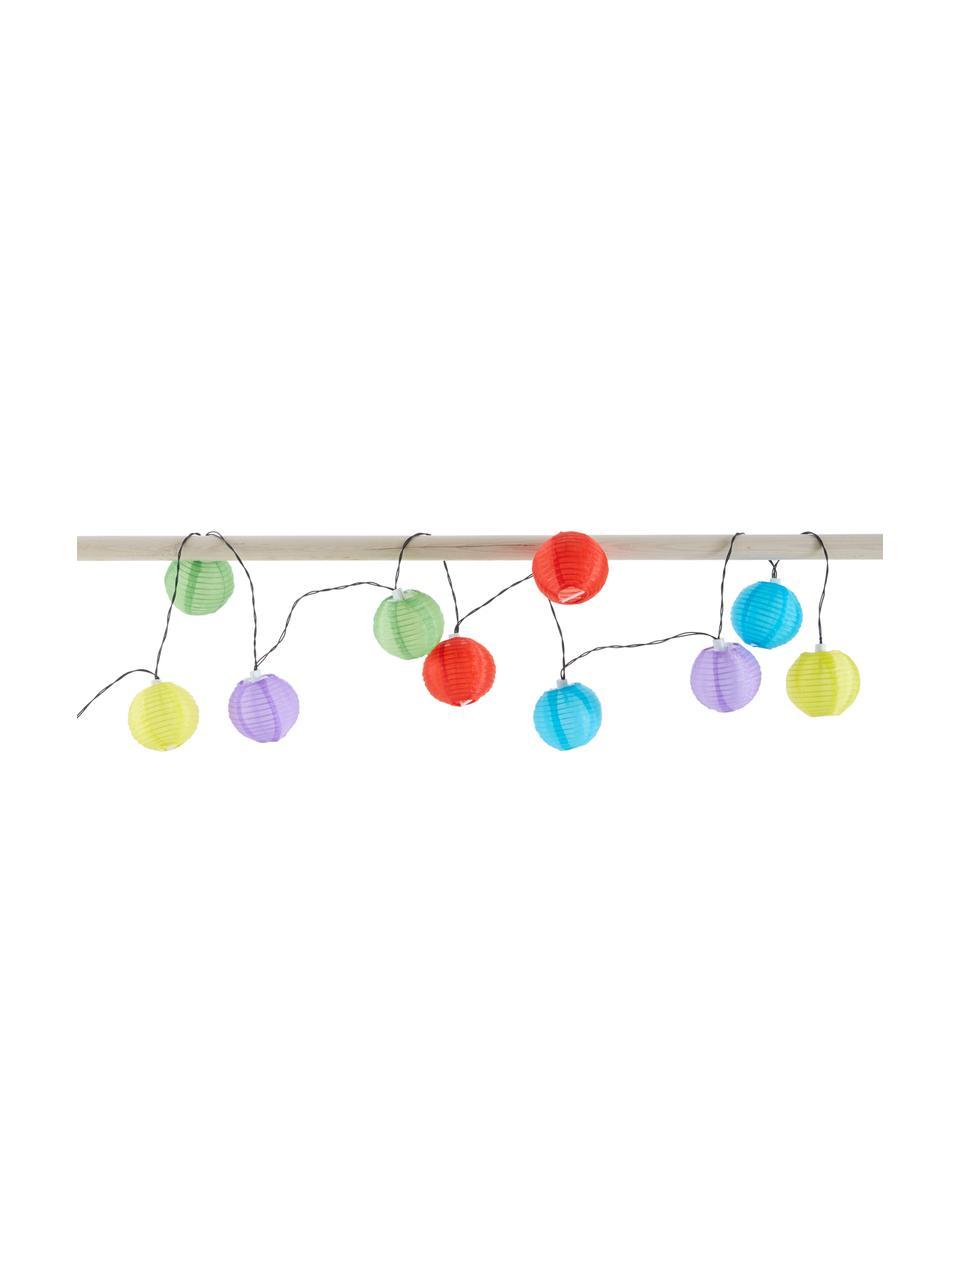 Ghirlanda a LED Lampion, 380 cm, 10 lampioni, Lanterne: materiale sintetico, Multicolore, Lung. 380 cm